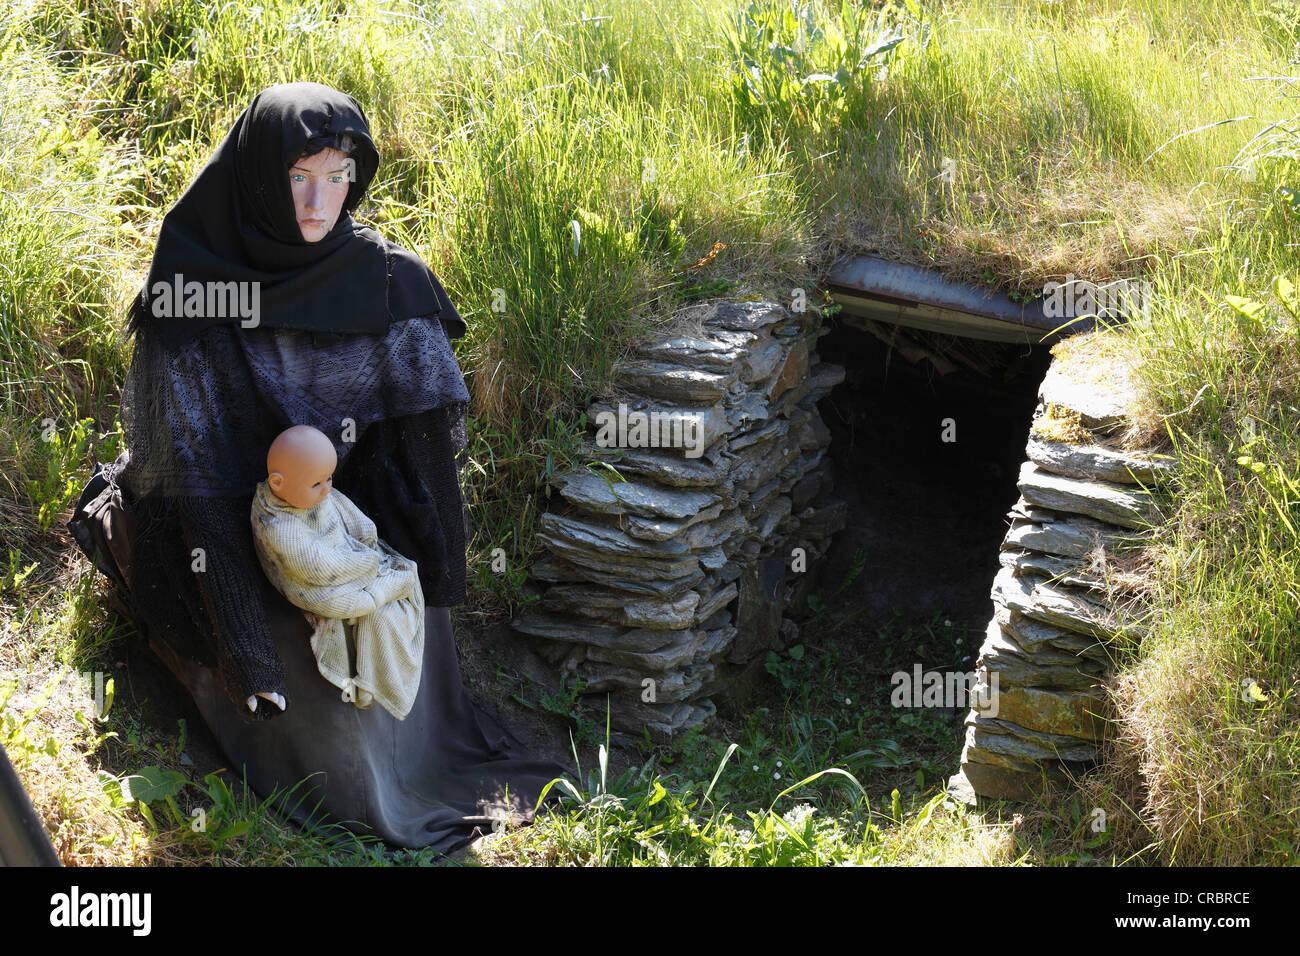 Doagh Famine Village Museum, Ballyliffin, Inishowen Peninsula, County Donegal, Ireland, British Isles, Europe - Stock Image